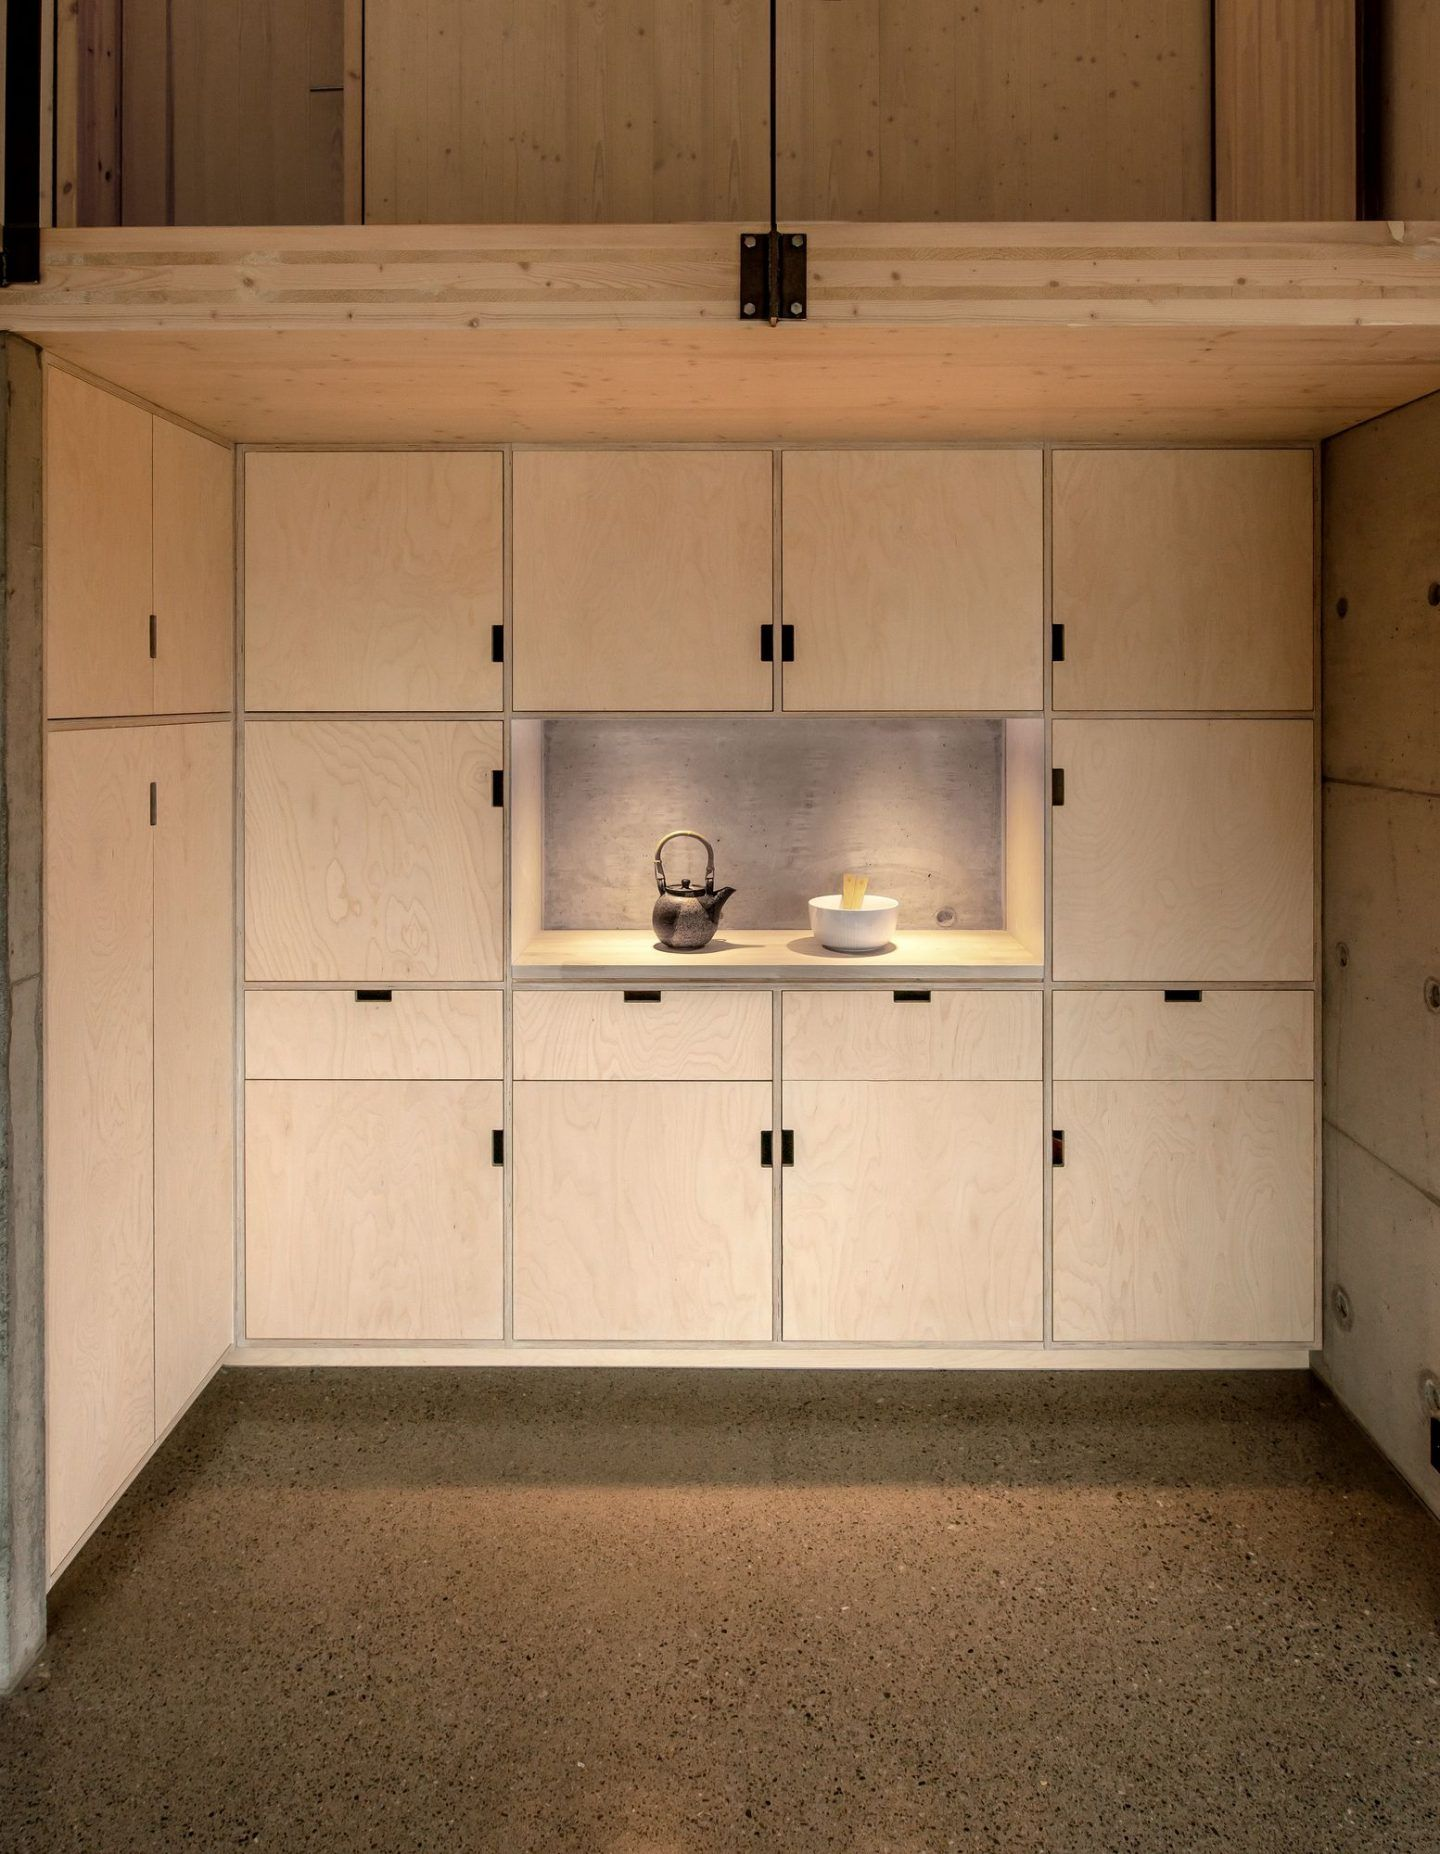 IGNANT-Architecture-Sanden-Hodnekvam-Cabin-Rones-18